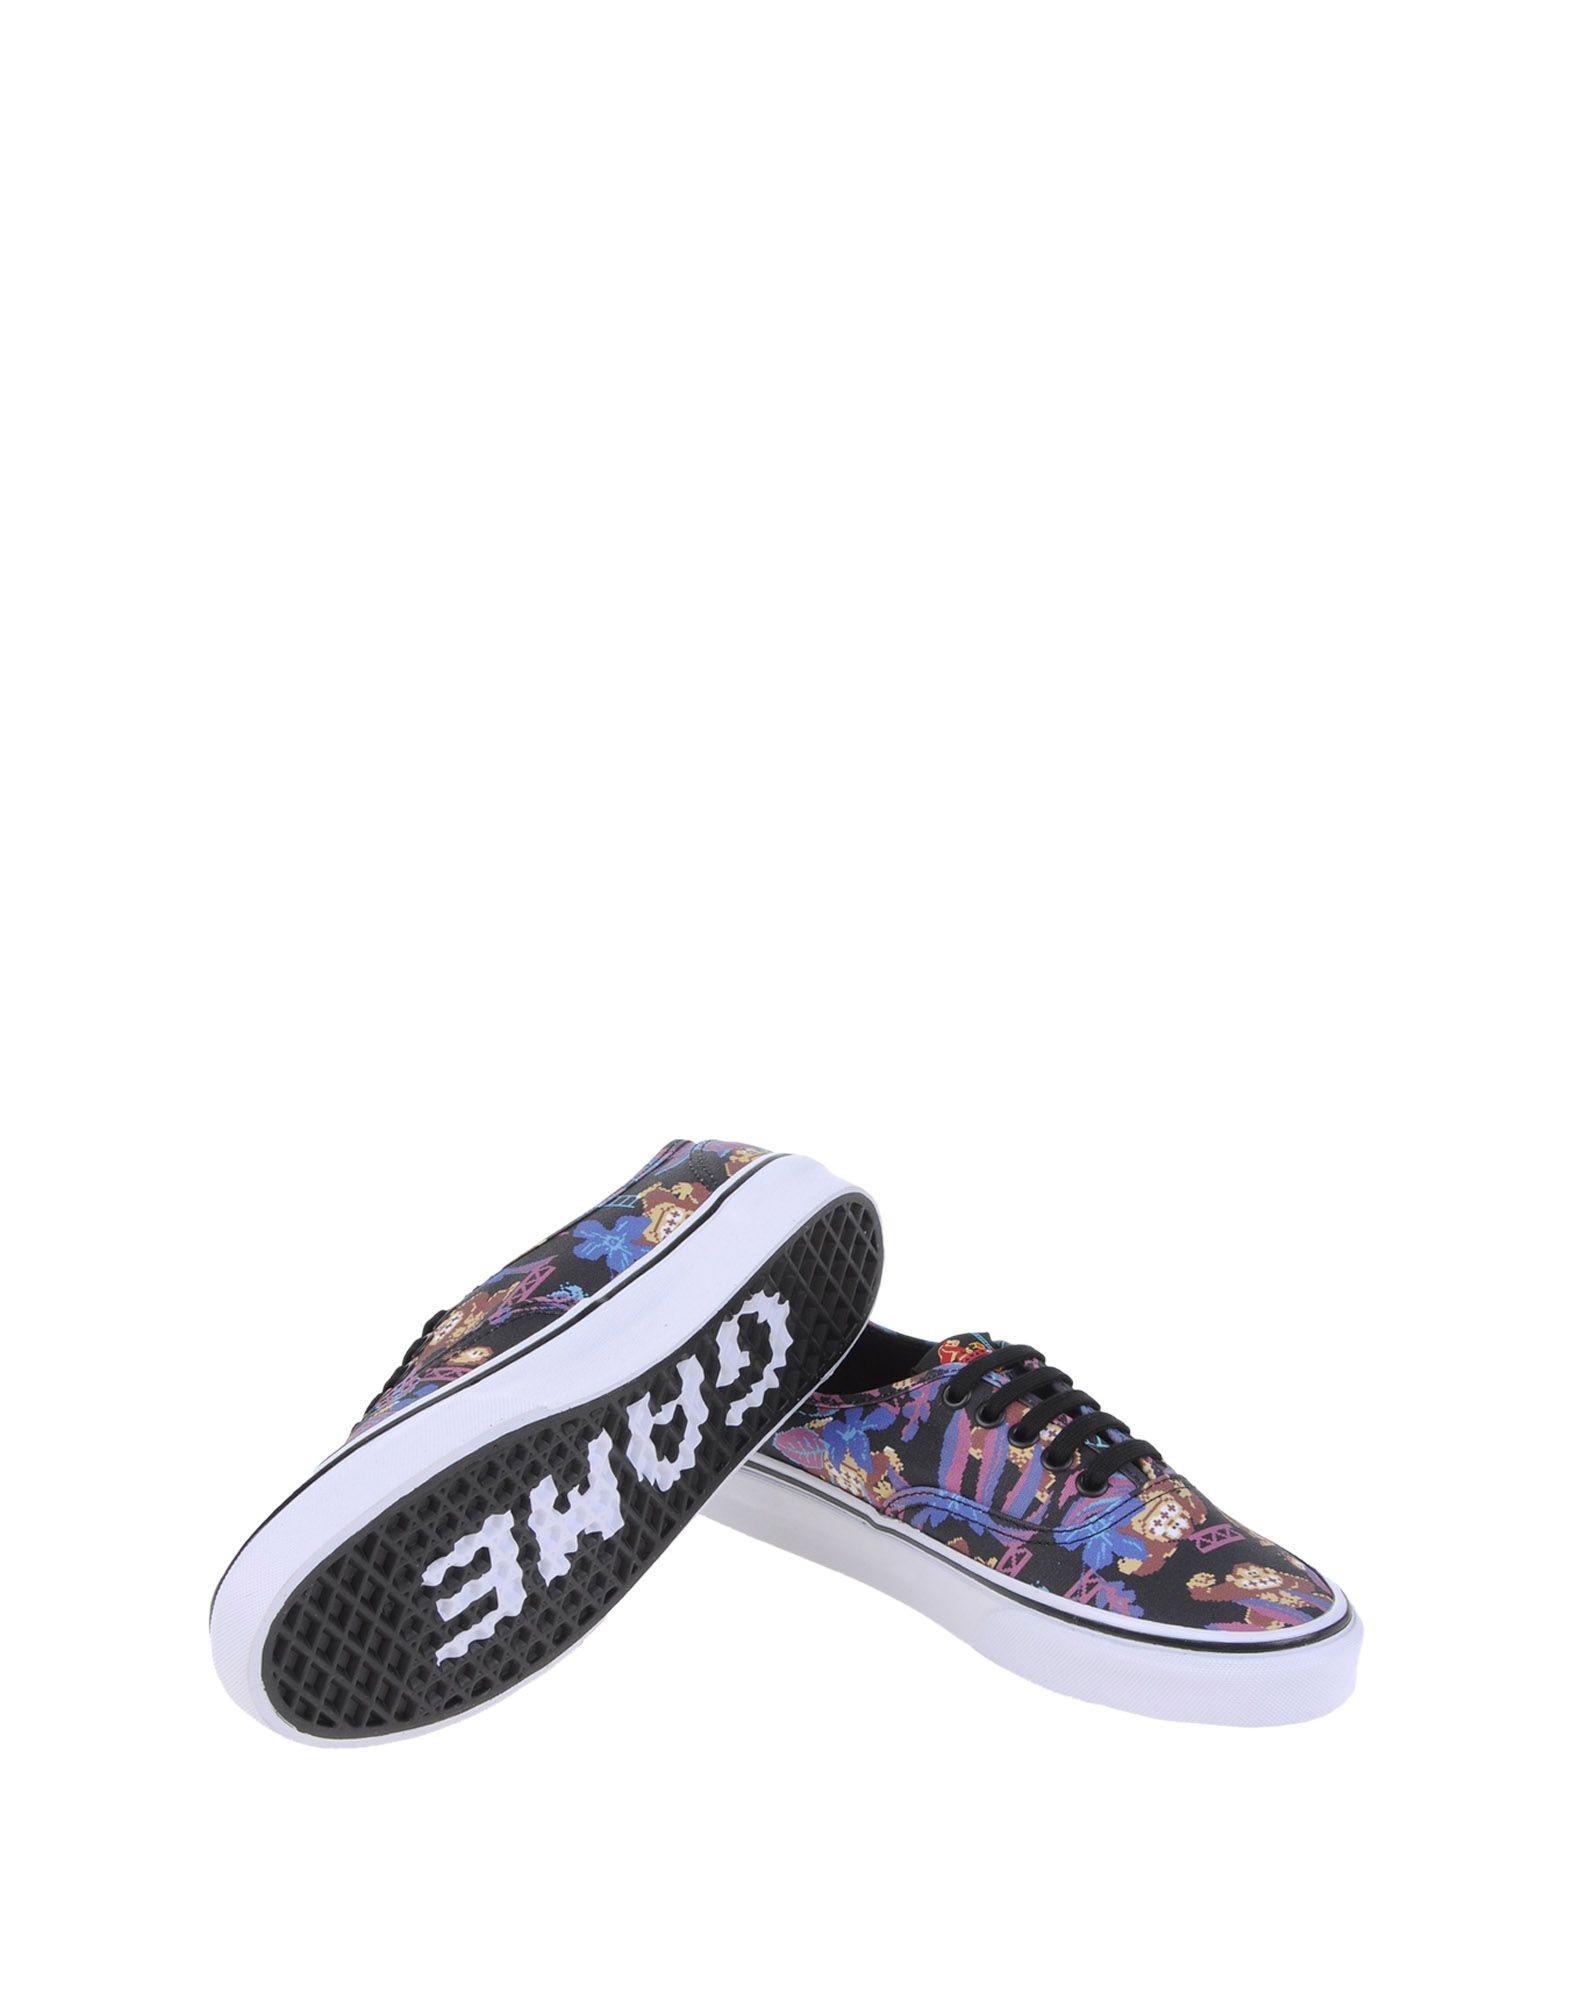 Vans 11066782SI U Authentic Nintendo Donkey Kong  11066782SI Vans Gute Qualität beliebte Schuhe b4def3